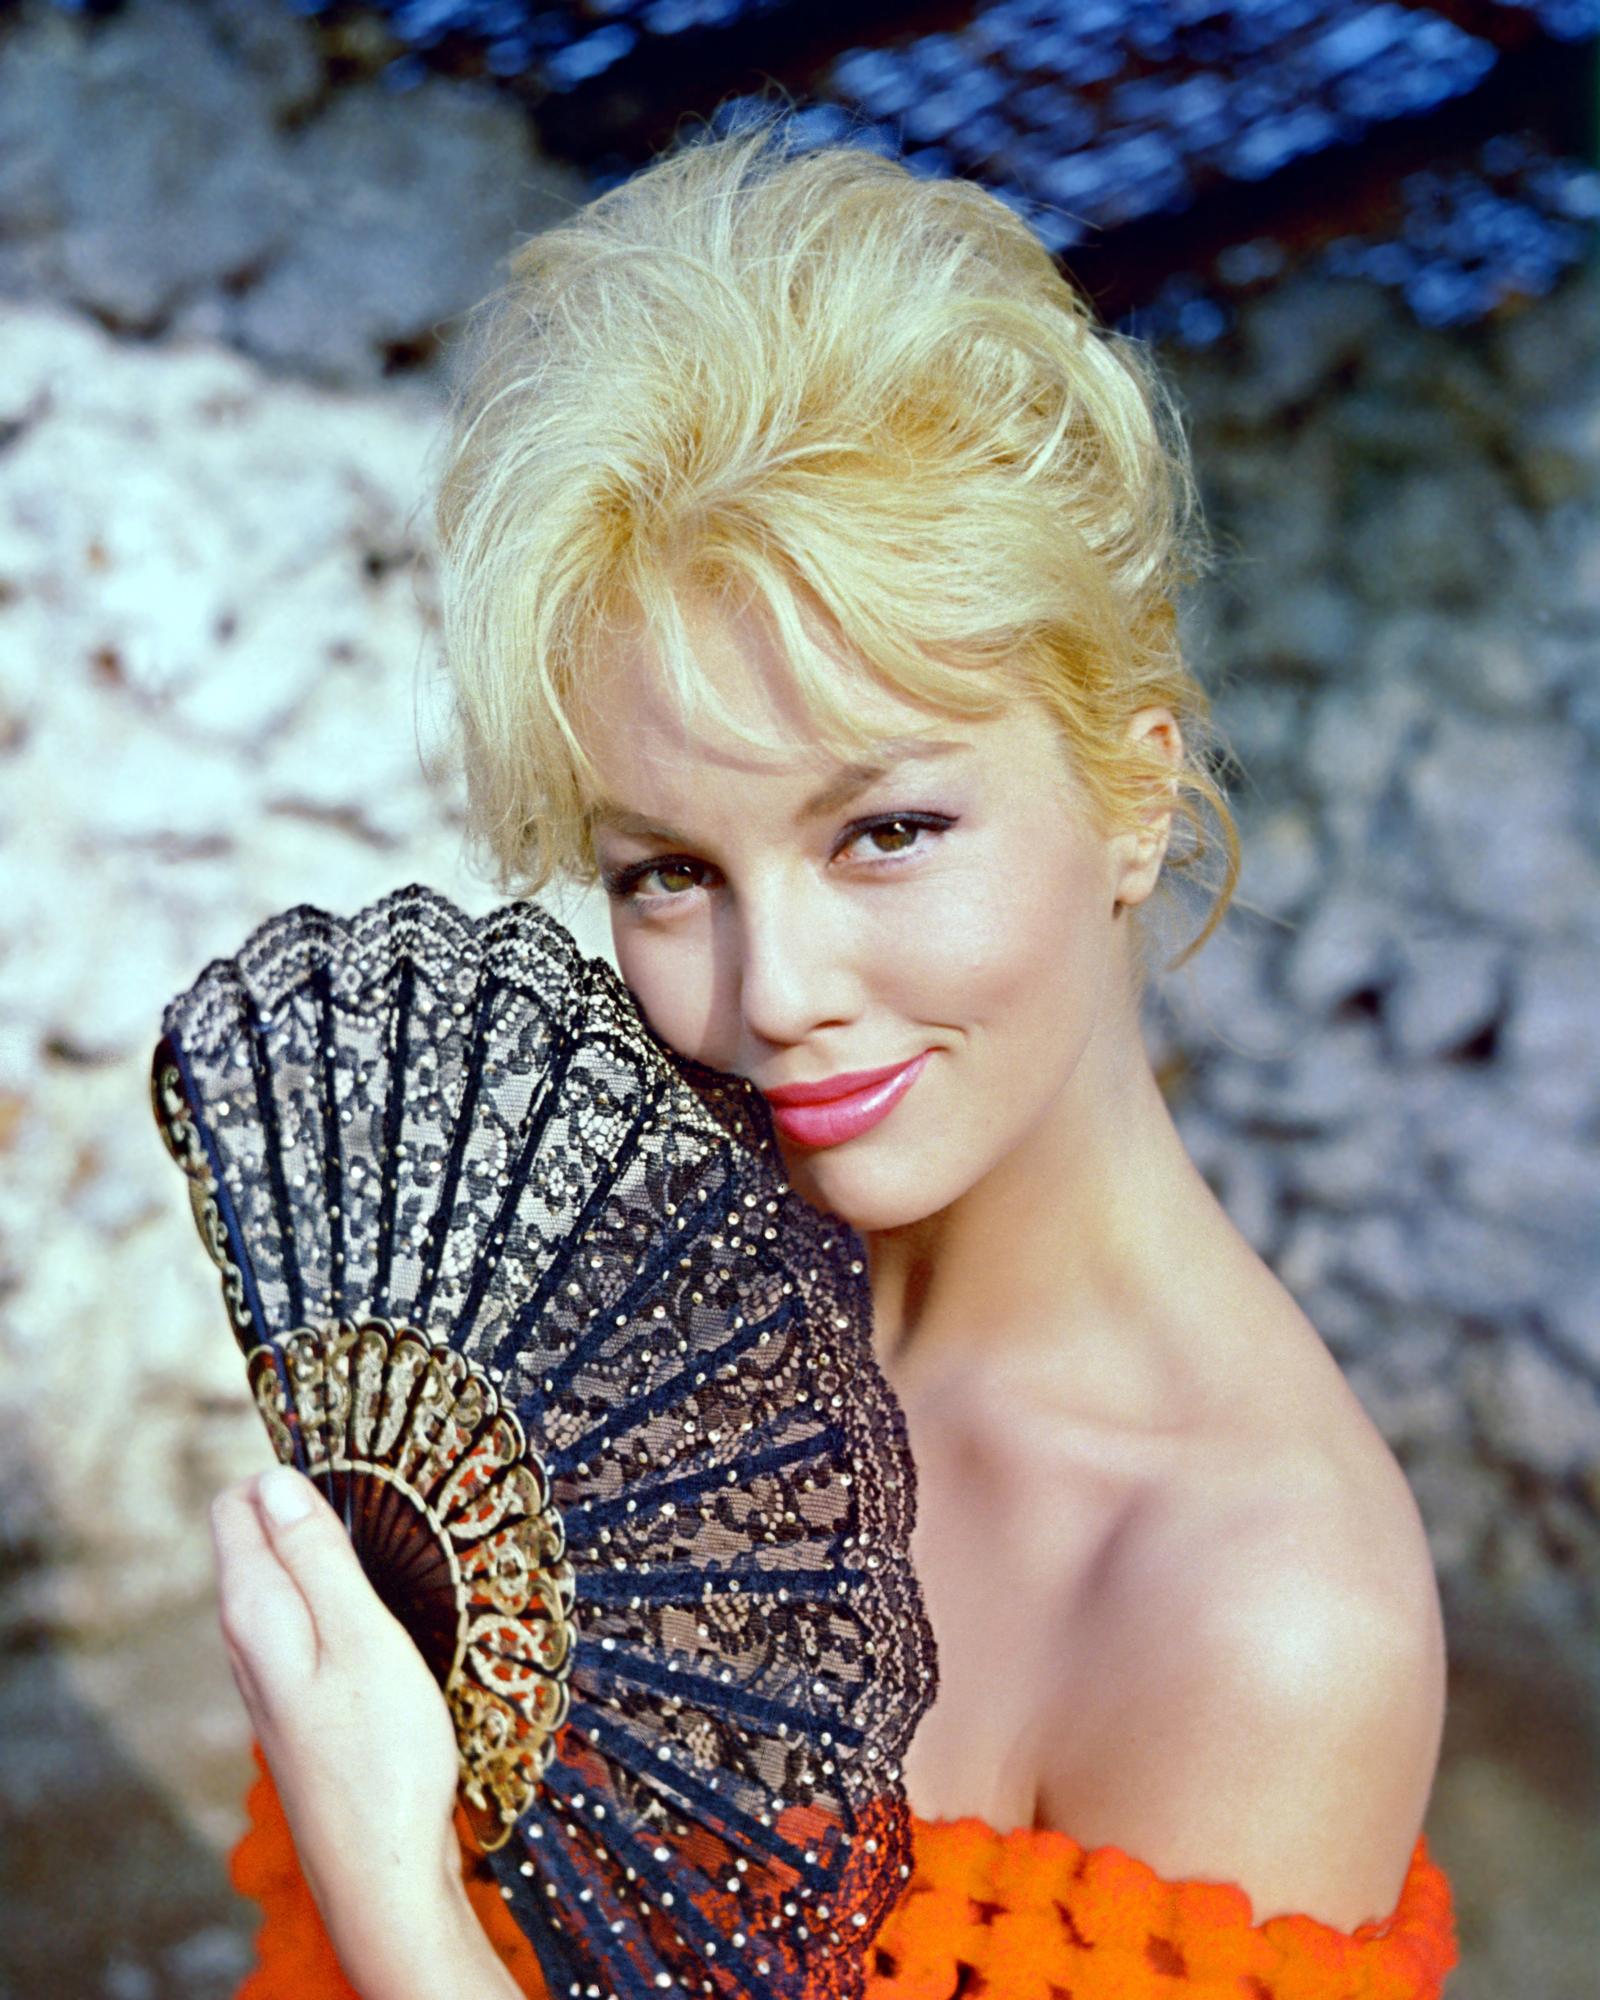 People 1600x2000 women actress blonde long hair Mylène Demongeot French vintage old photos portrait display smiling bare shoulders bangs orange dress brown eyes